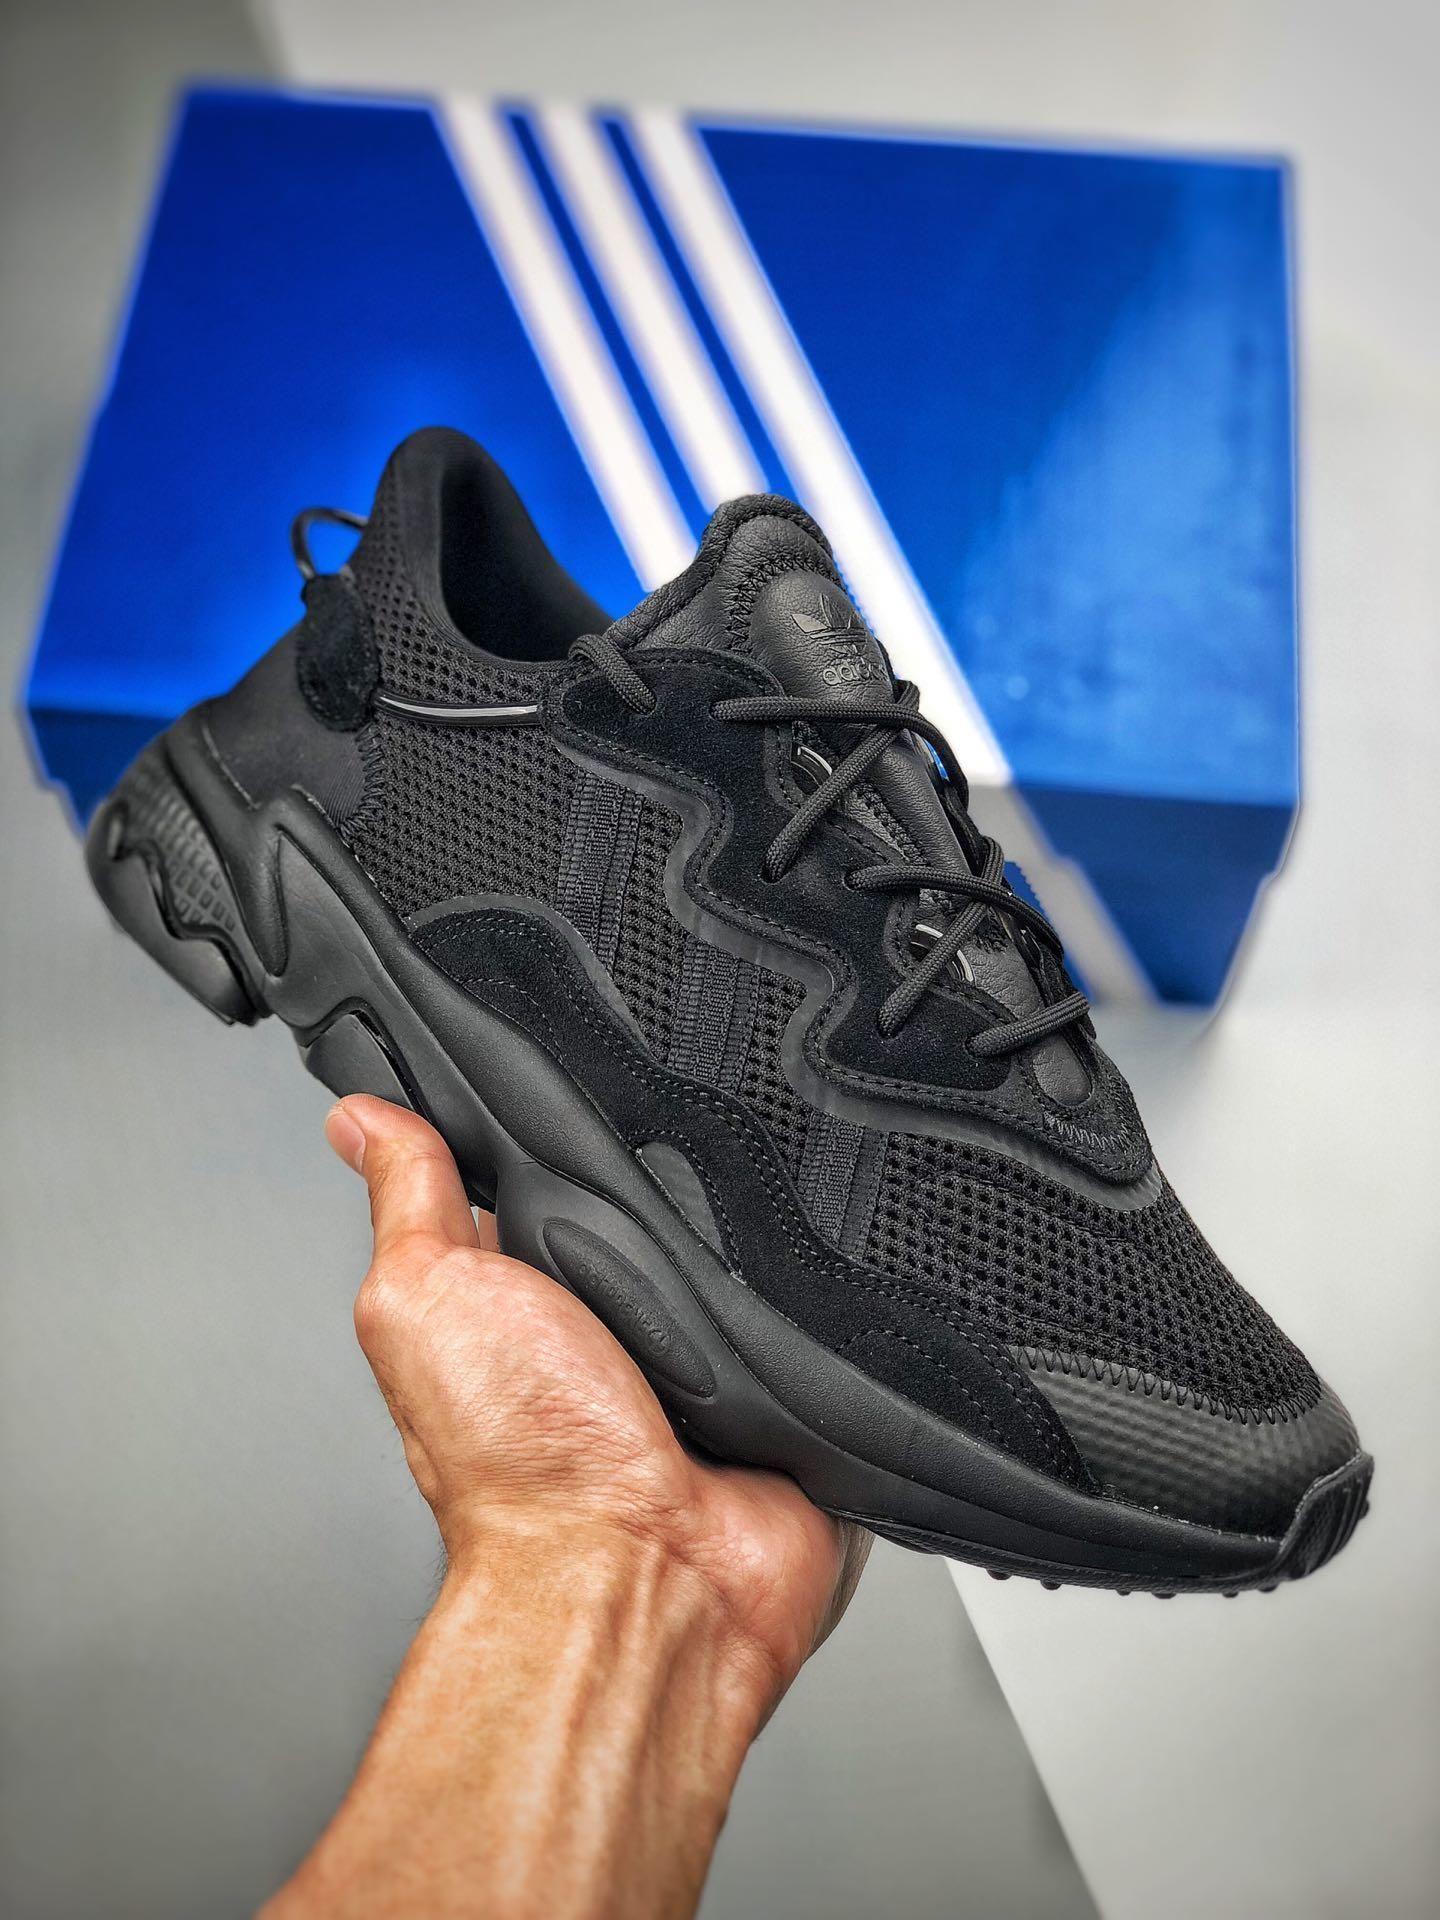 adidas OZWEEGO Schoenen Groen | adidas Officiële Shop